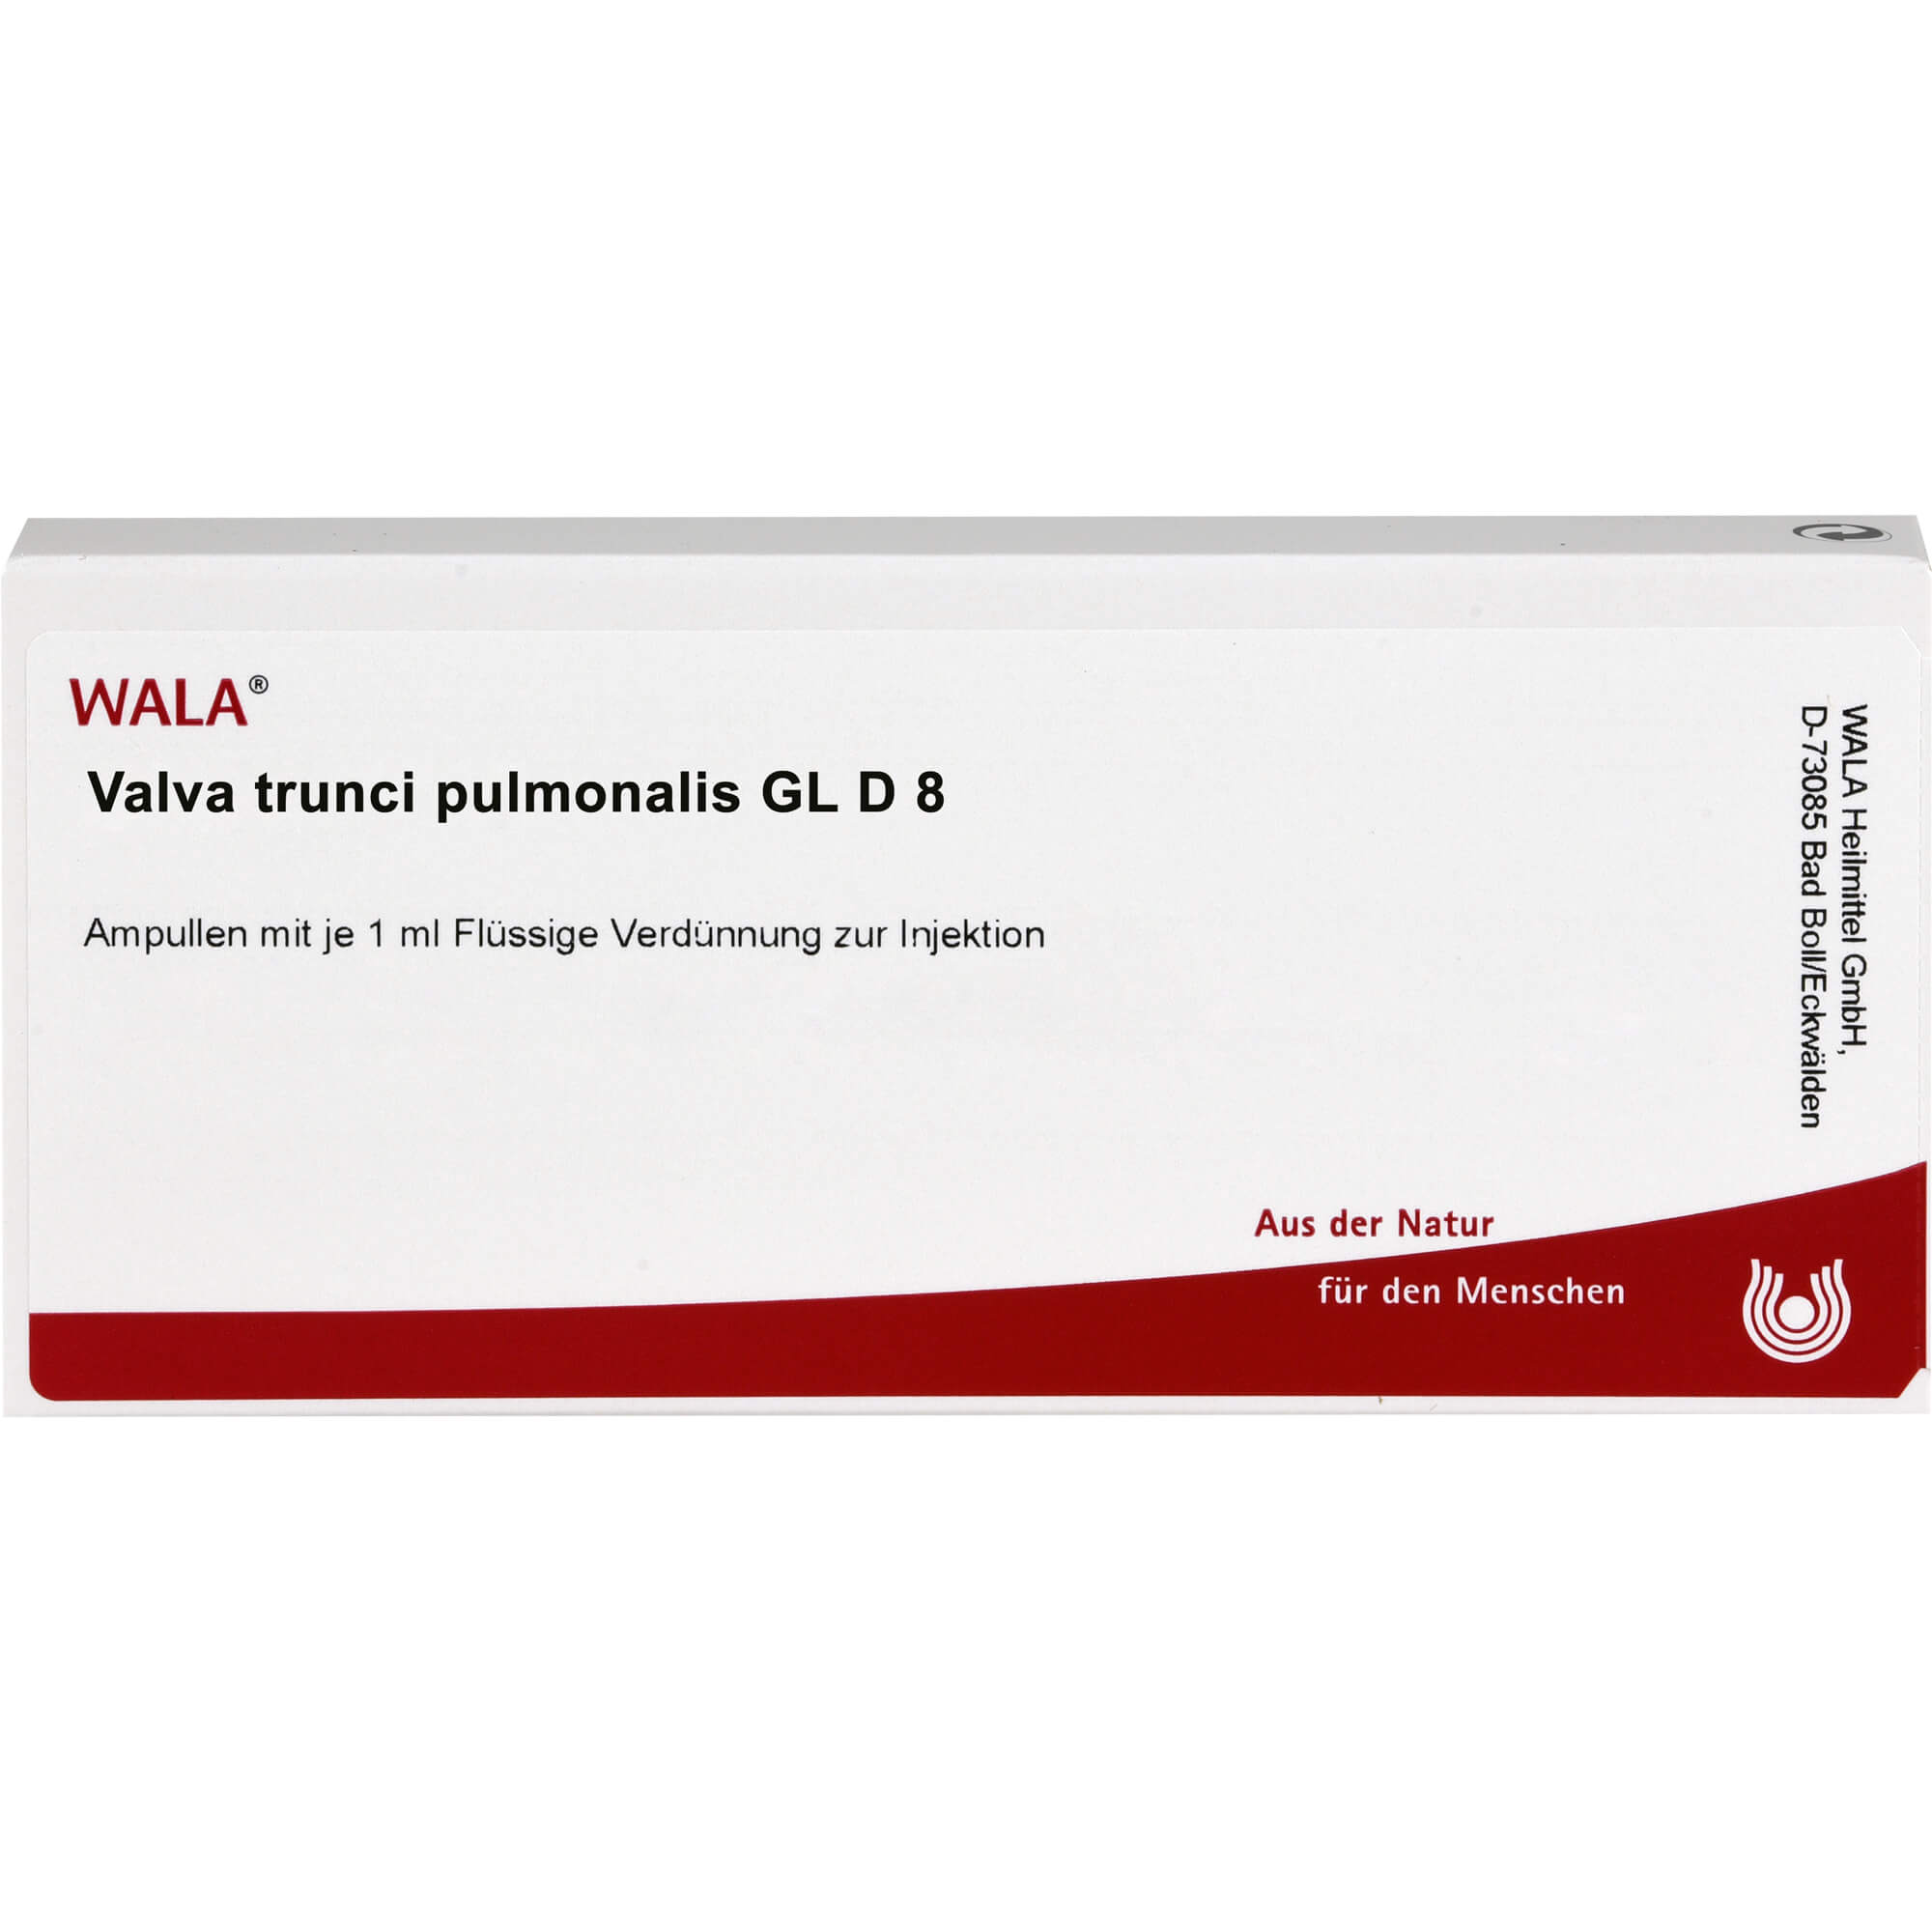 VALVA trunci pulmonalis GL D 8 Ampullen